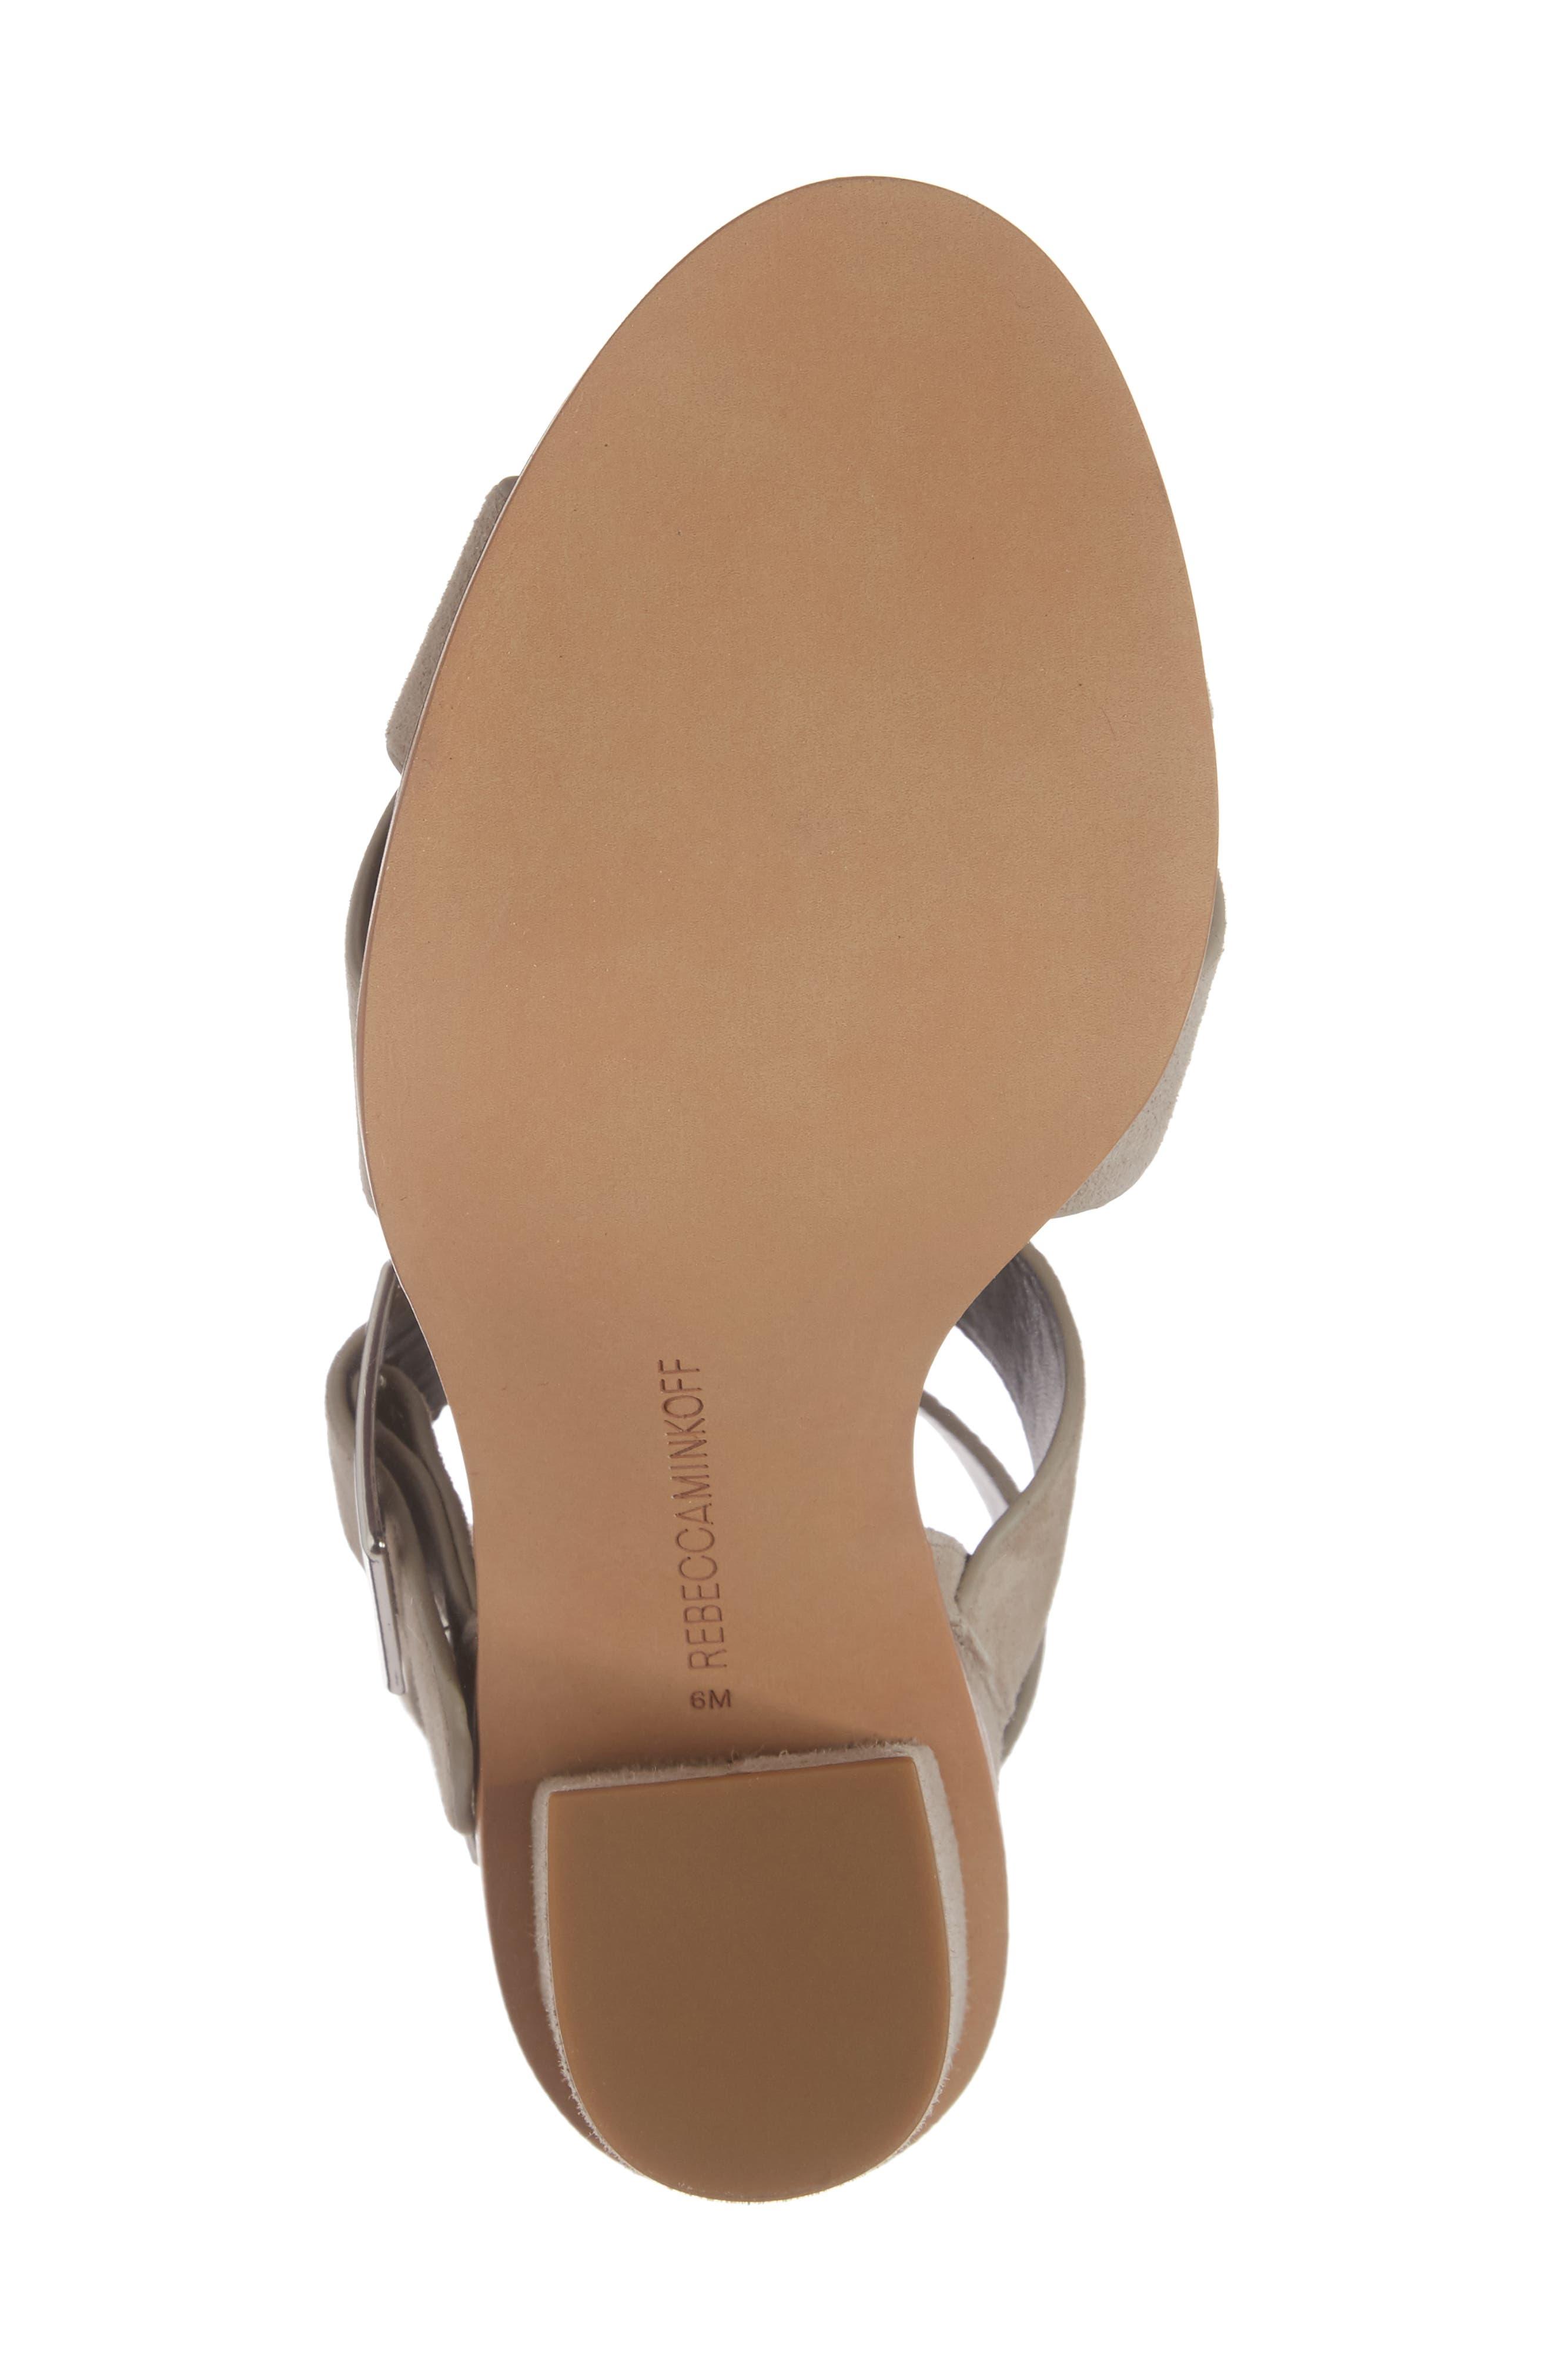 Jennifer Studded Ankle Cuff Sandal,                             Alternate thumbnail 17, color,